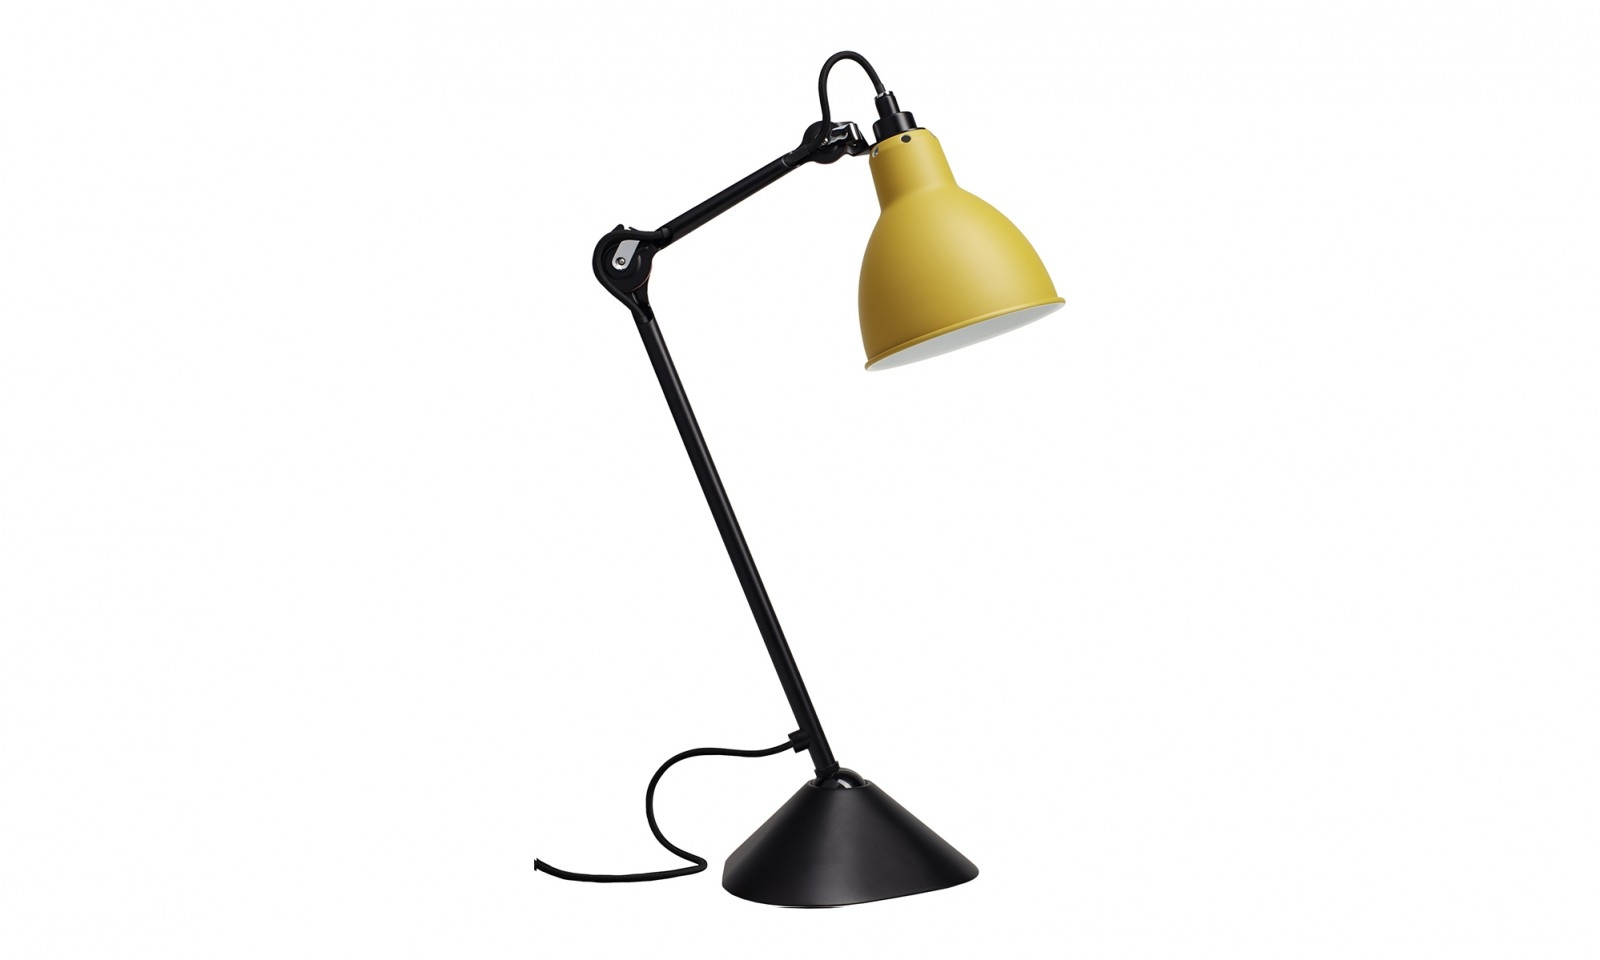 Lampe de table Gras 205 - DCW